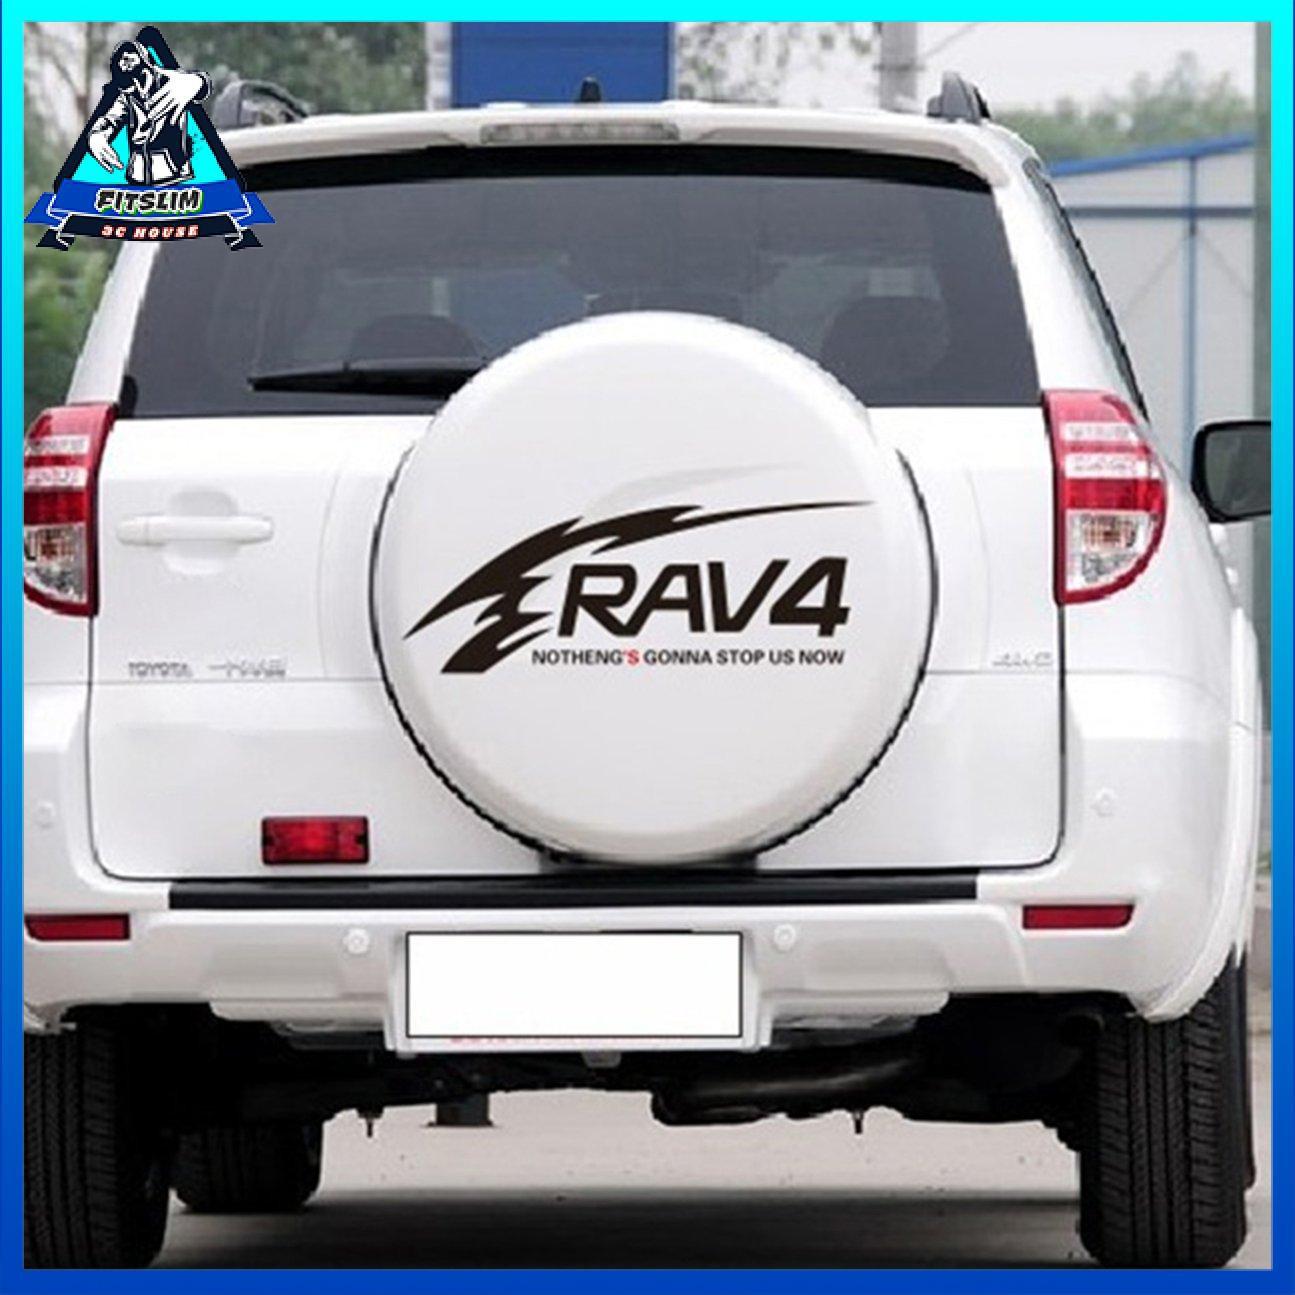 Toyota RAV4 car Stickers Reflective car Stickers RAV4 Spare tire Stickers Back tire Spare tire Cover Stickers